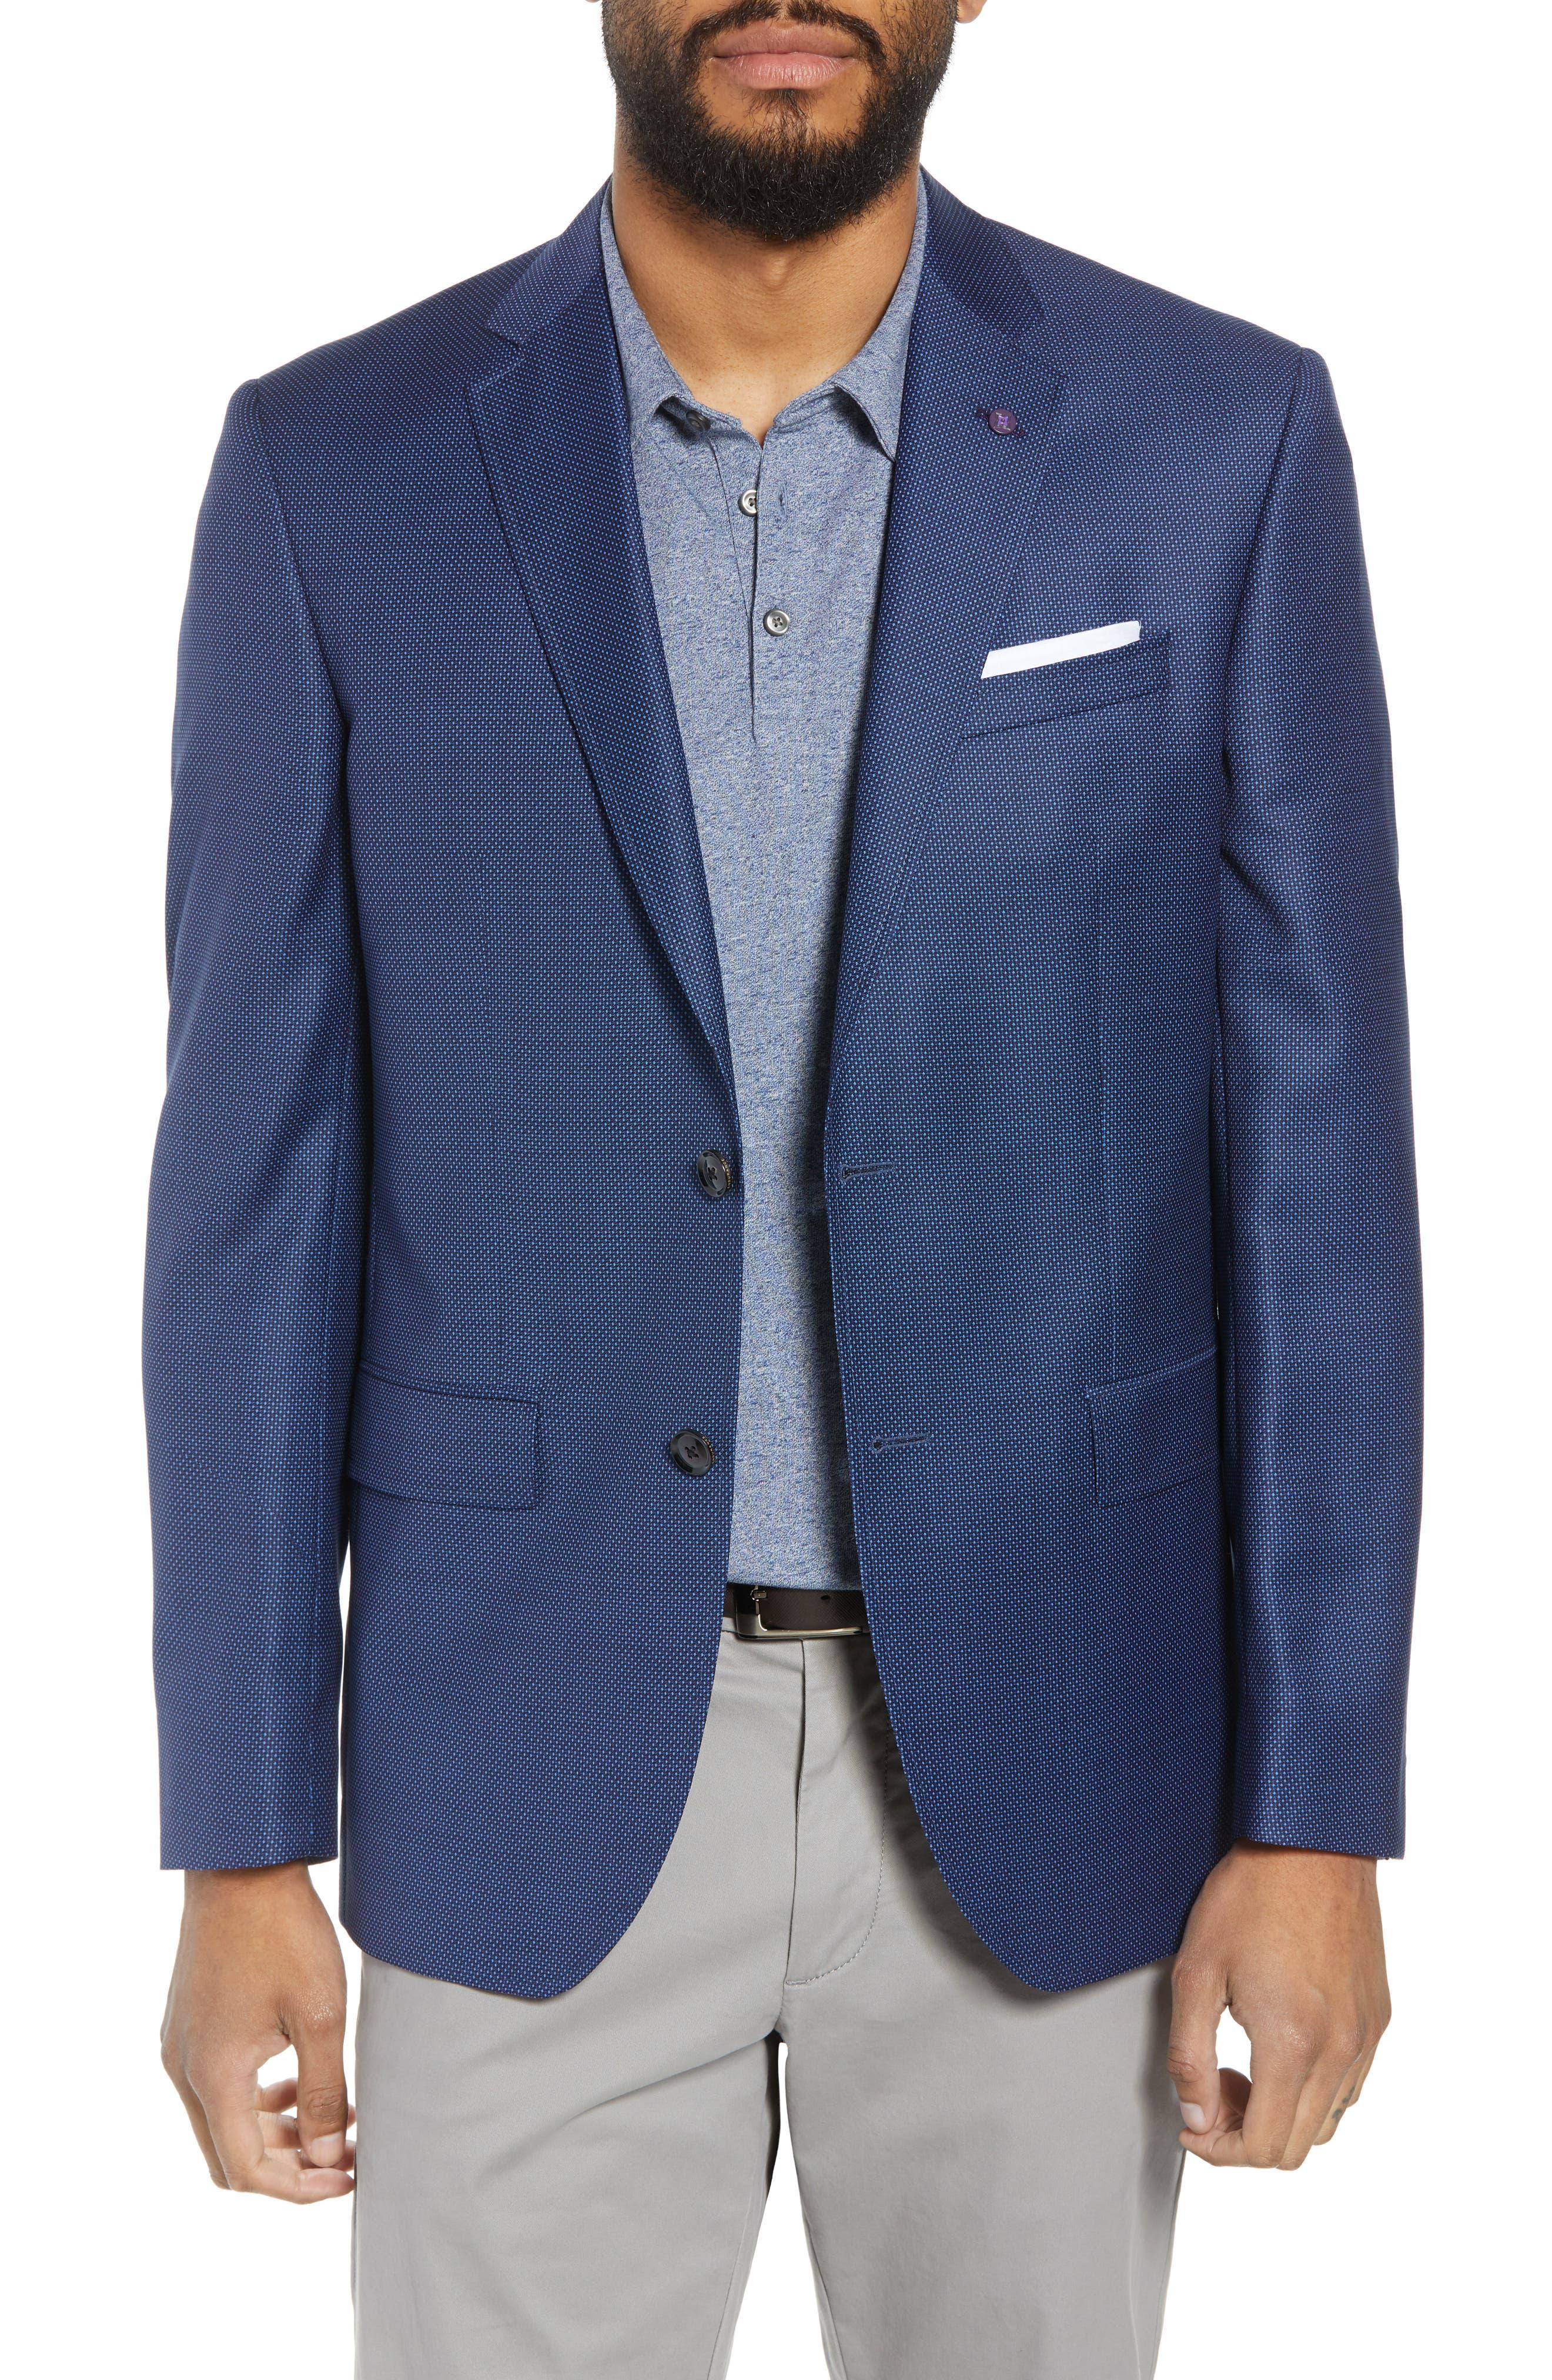 Jay Trim Fit Microdot Wool Sport Coat,                         Main,                         color, 400